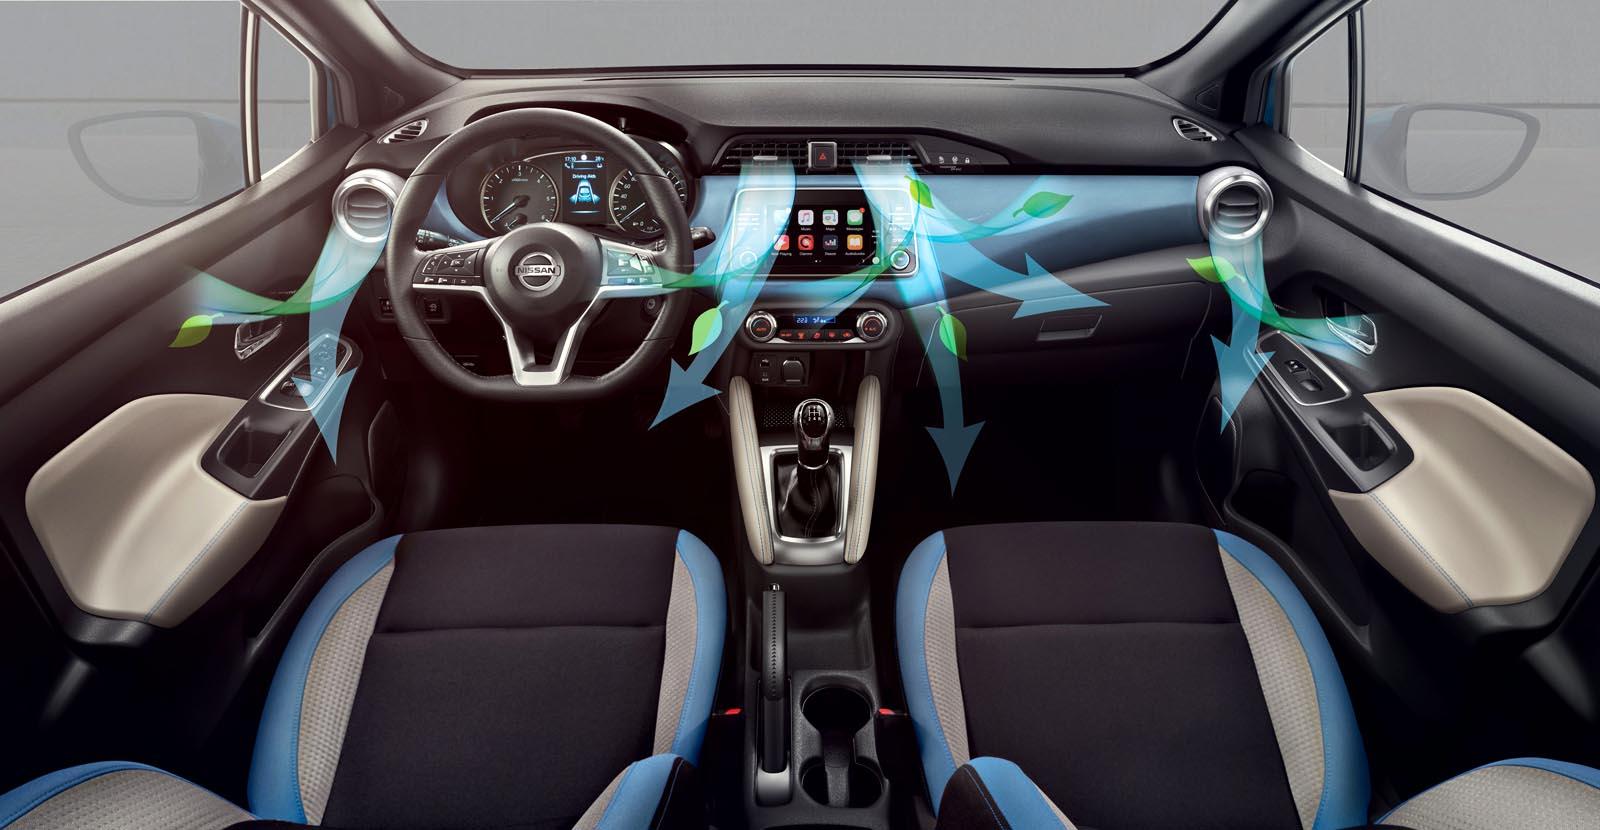 Photo of Νέα σειρά φίλτρων αέρα καμπίνας σε μοντέλα της Nissan, για την προστασία και την ευεξία των επιβατών